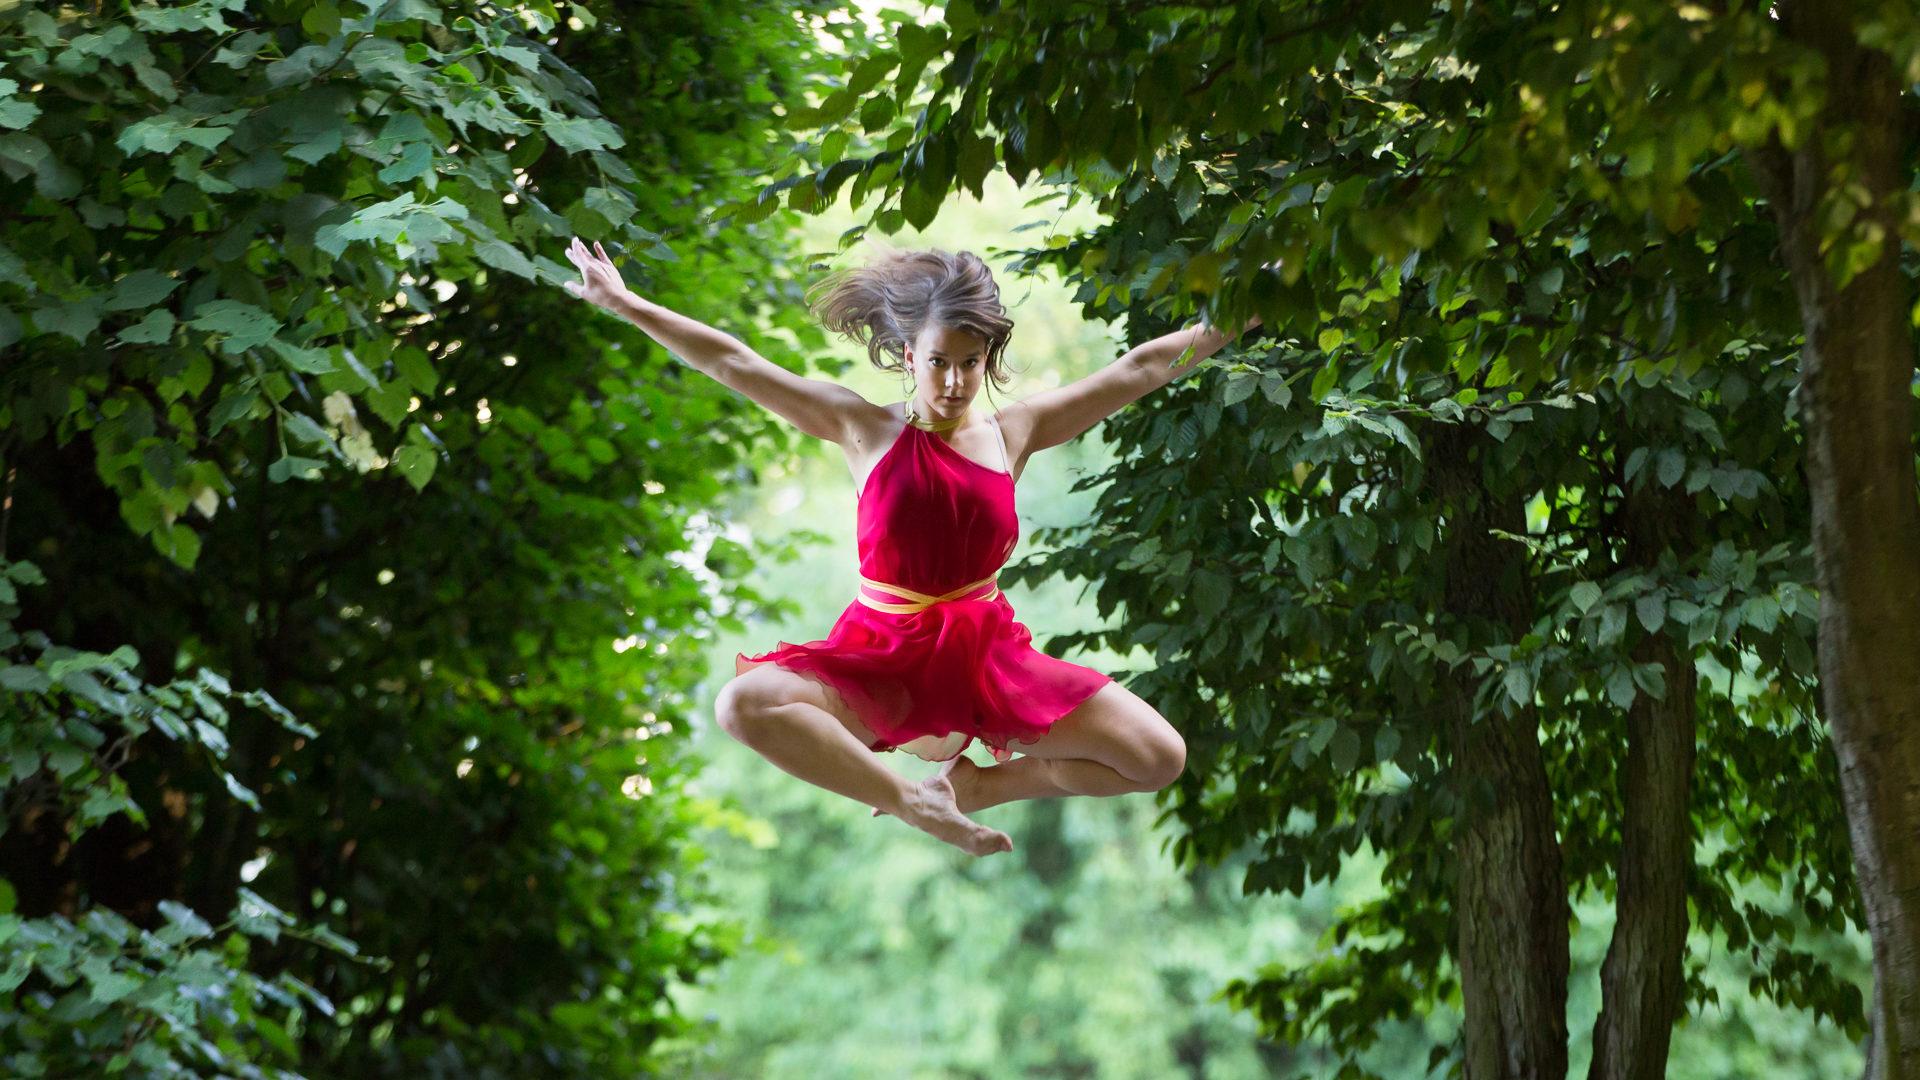 Lucyna-Lewandowska-tancerka